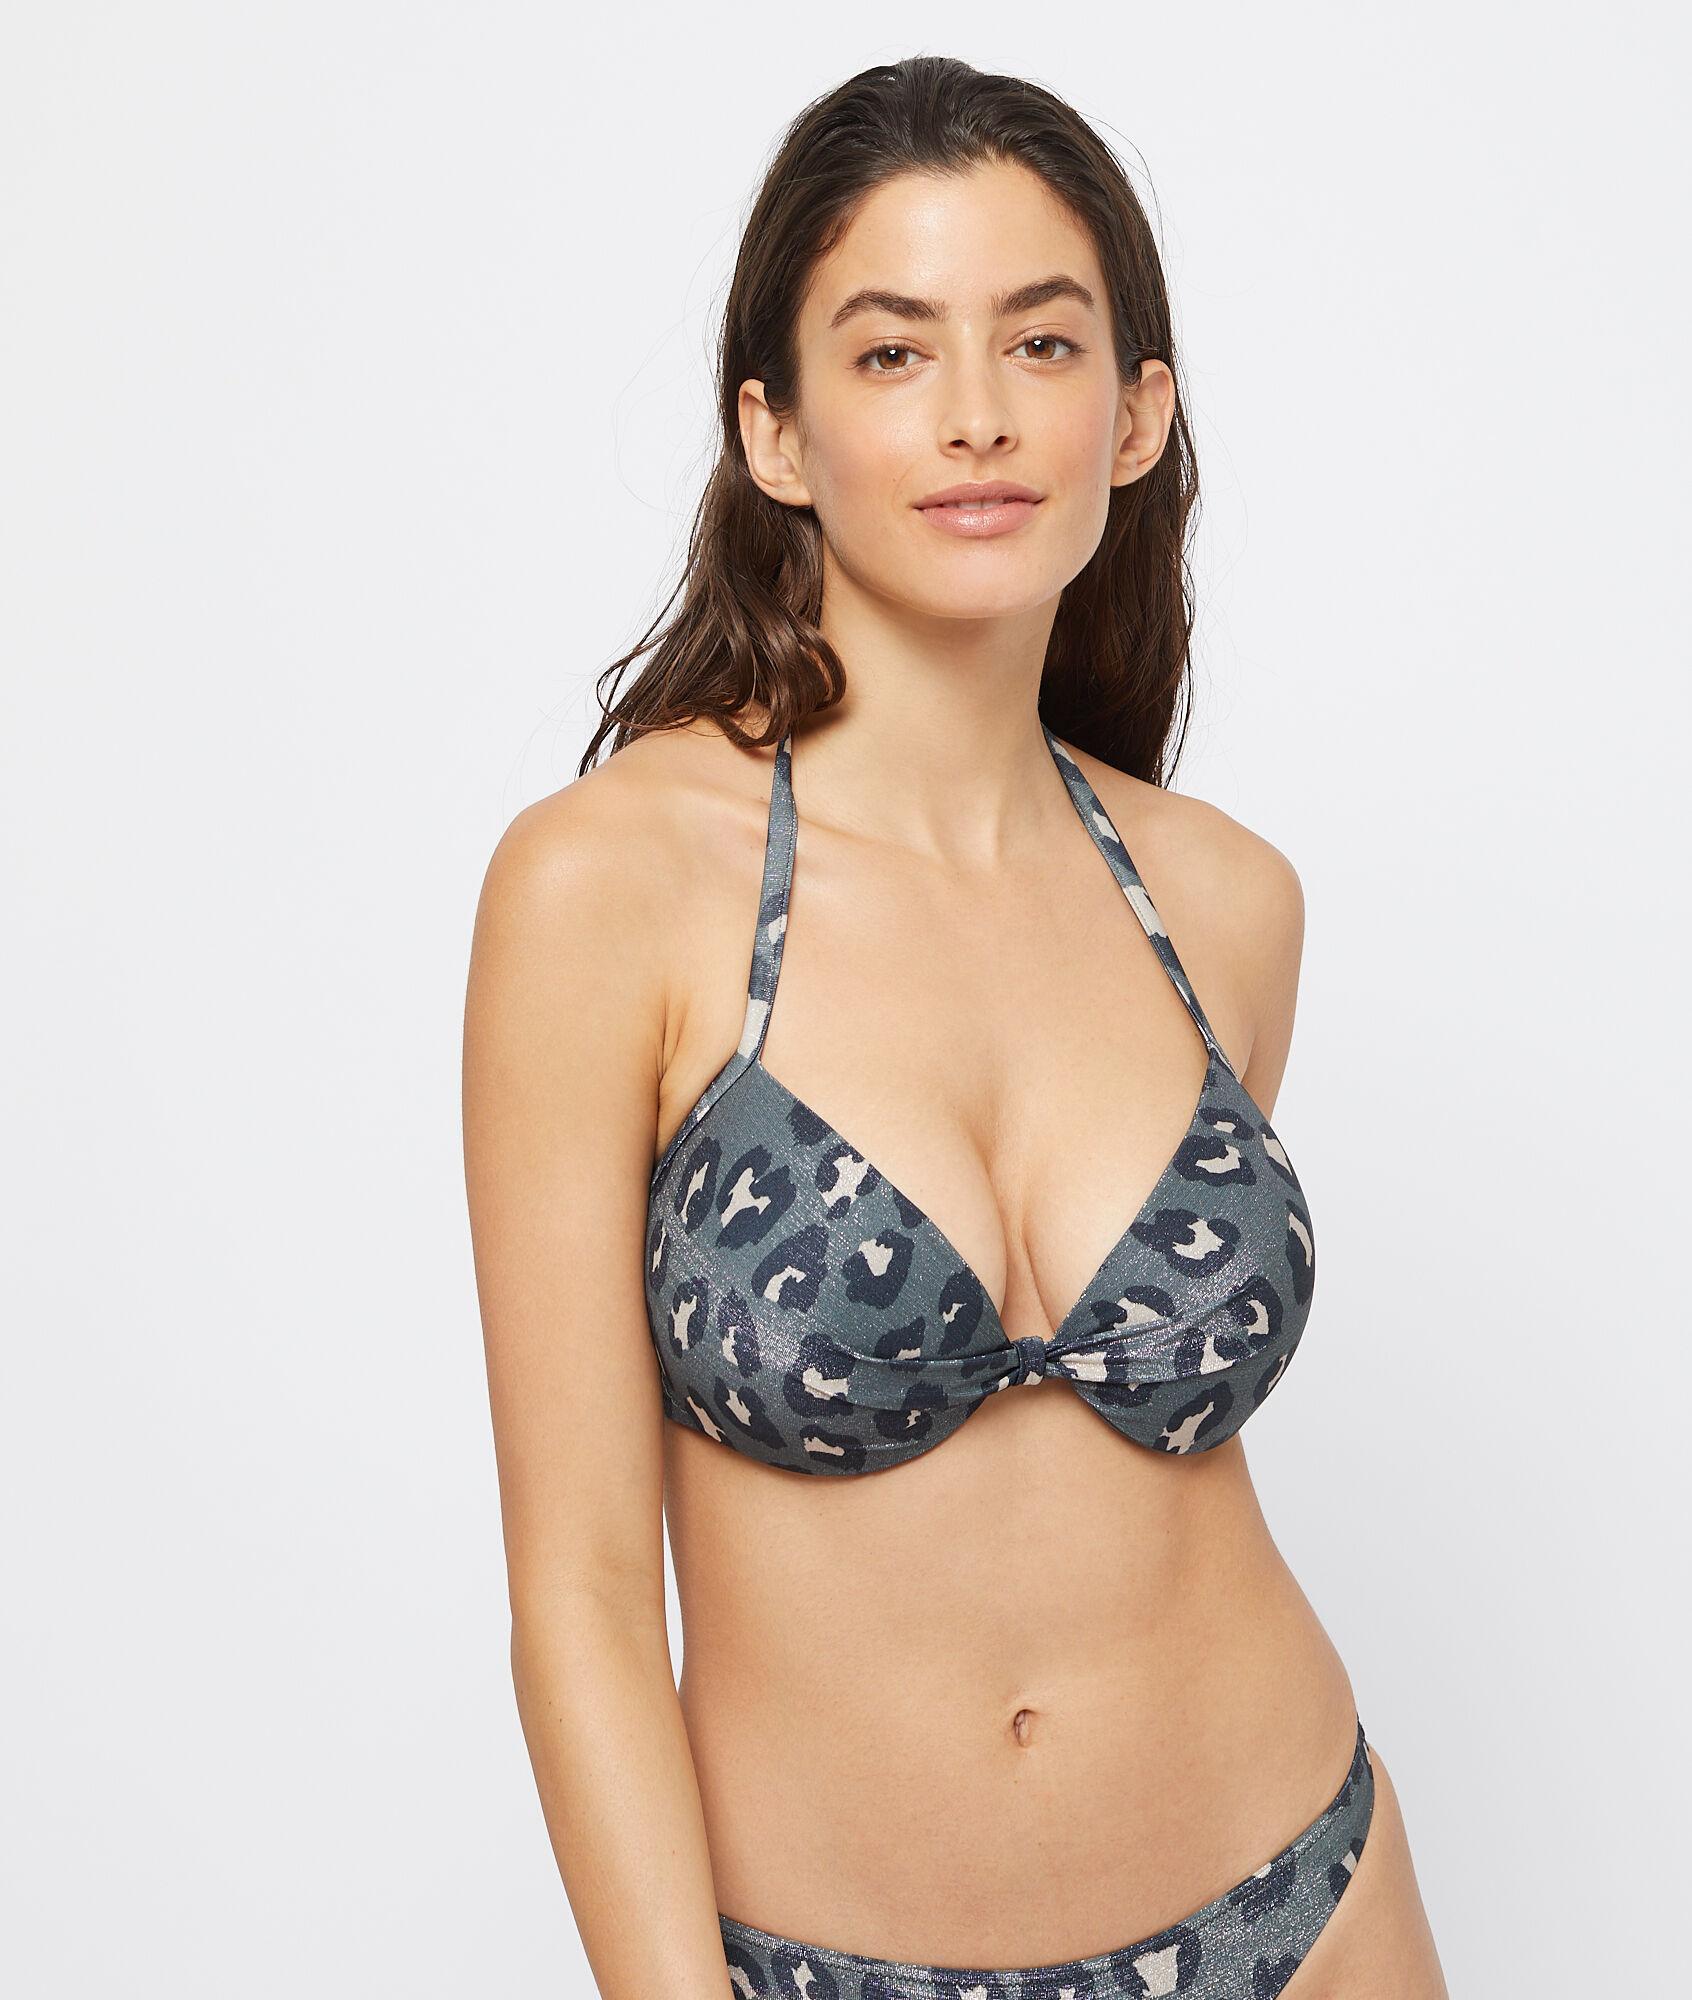 2462ec938 Sujetador bikini con foam estampado leopardo. Copa C-D - EARTH ...